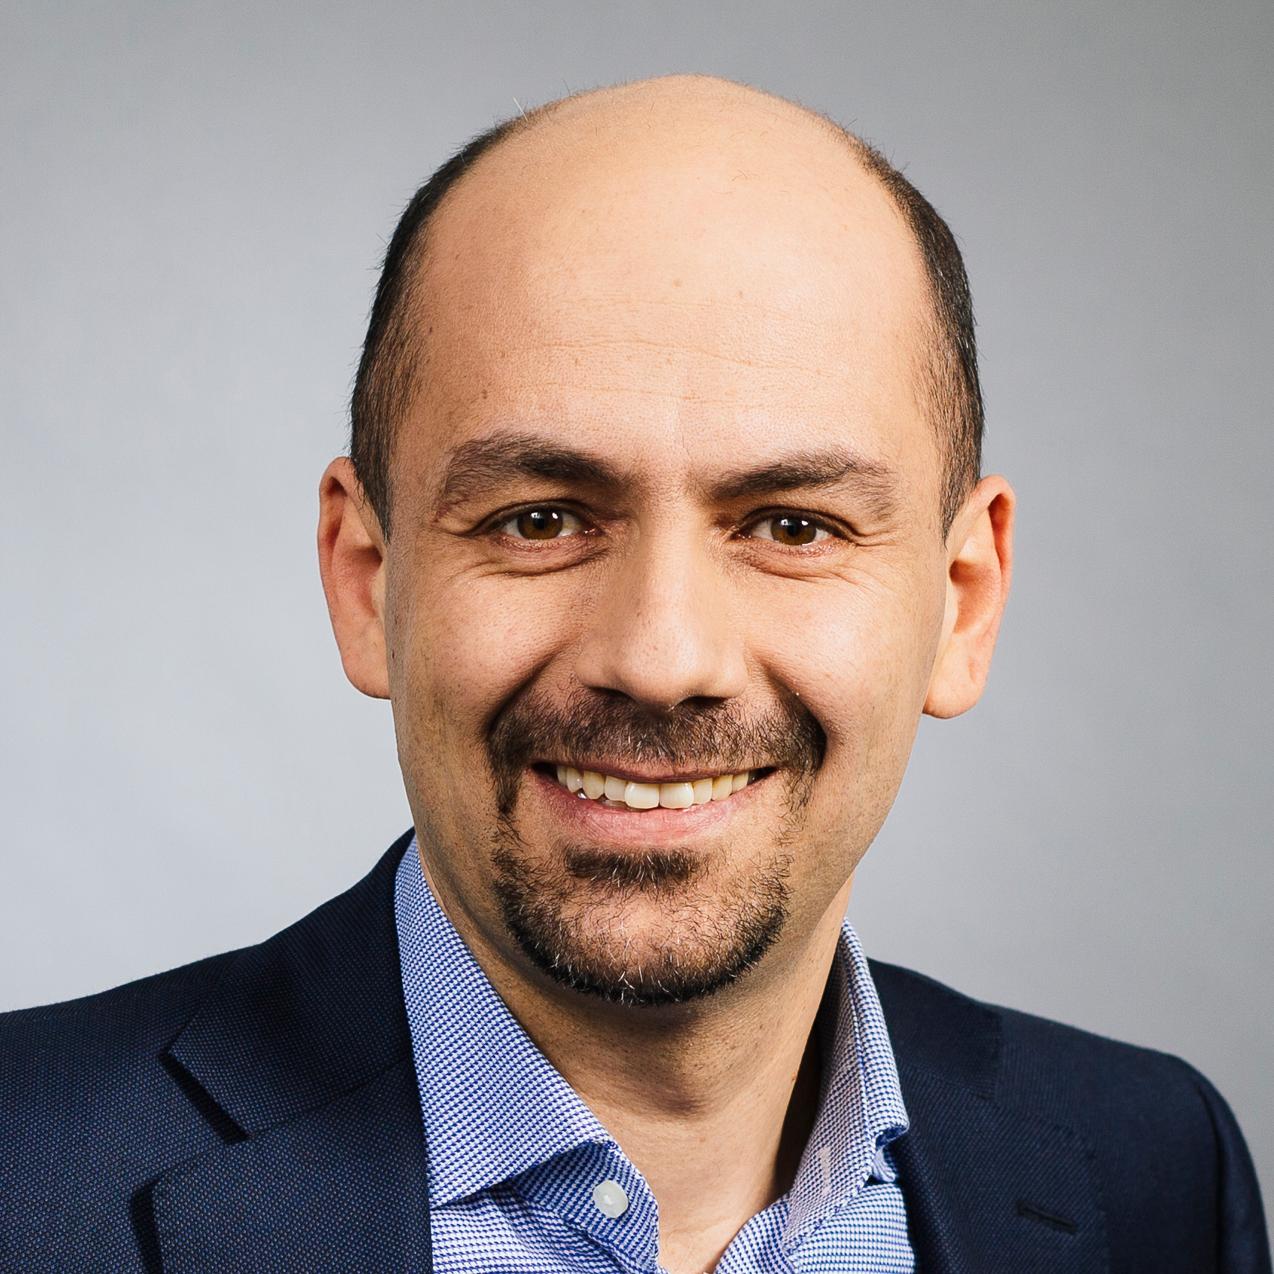 Dr. Ramin Assadollahi (CEO ExB Group)